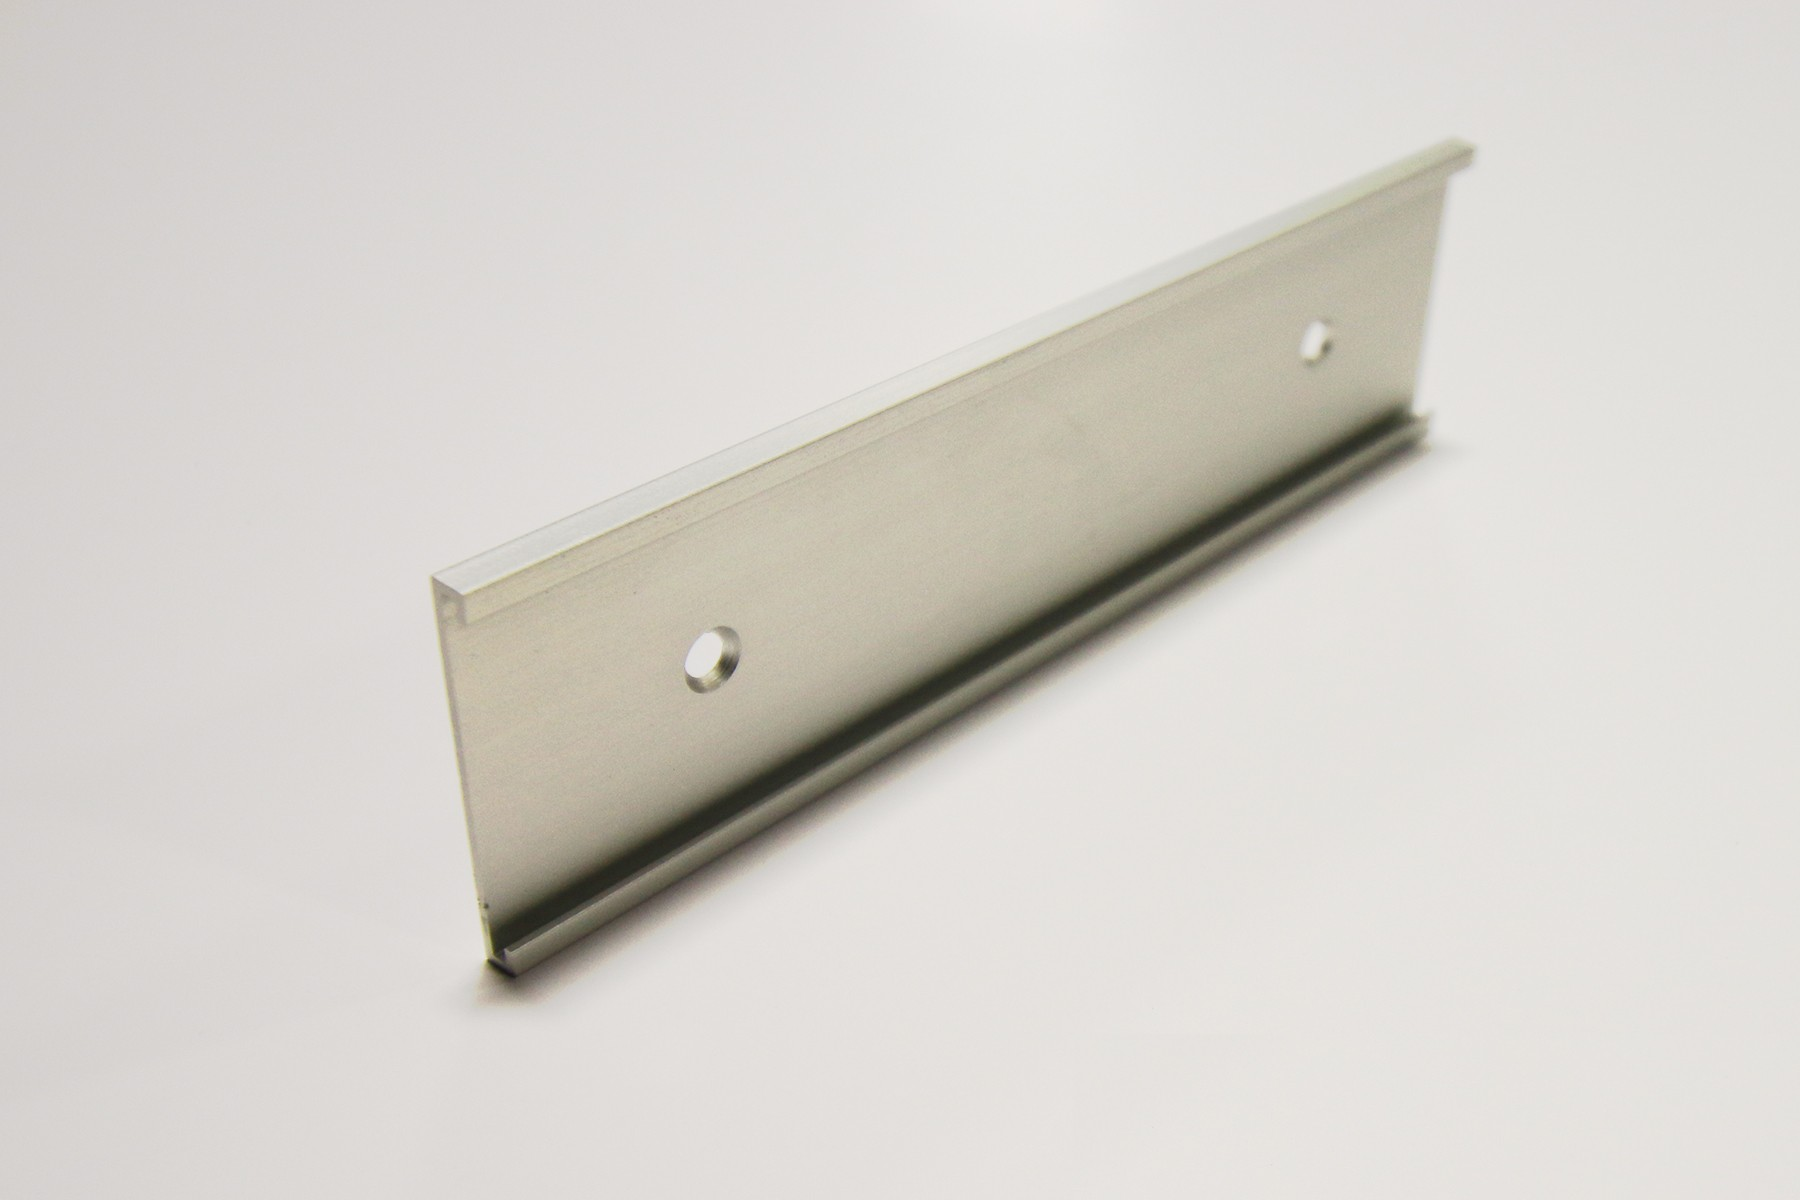 1-1/2 x 10 Wall Holder, Stn Silver